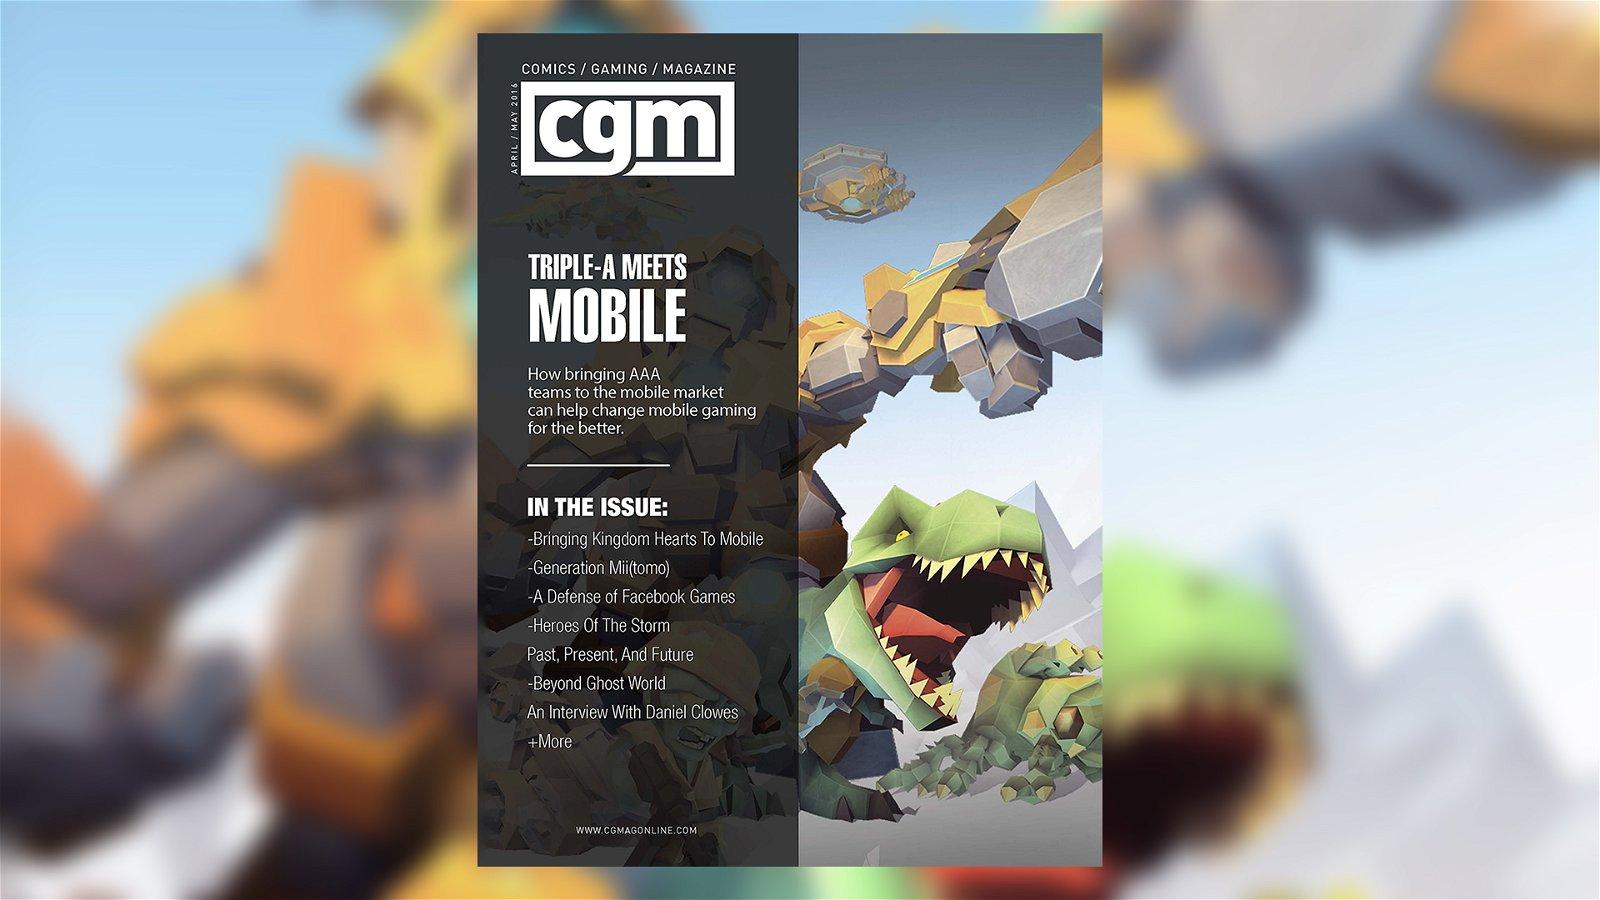 CGMagazine May 2016: Going Mobile 1